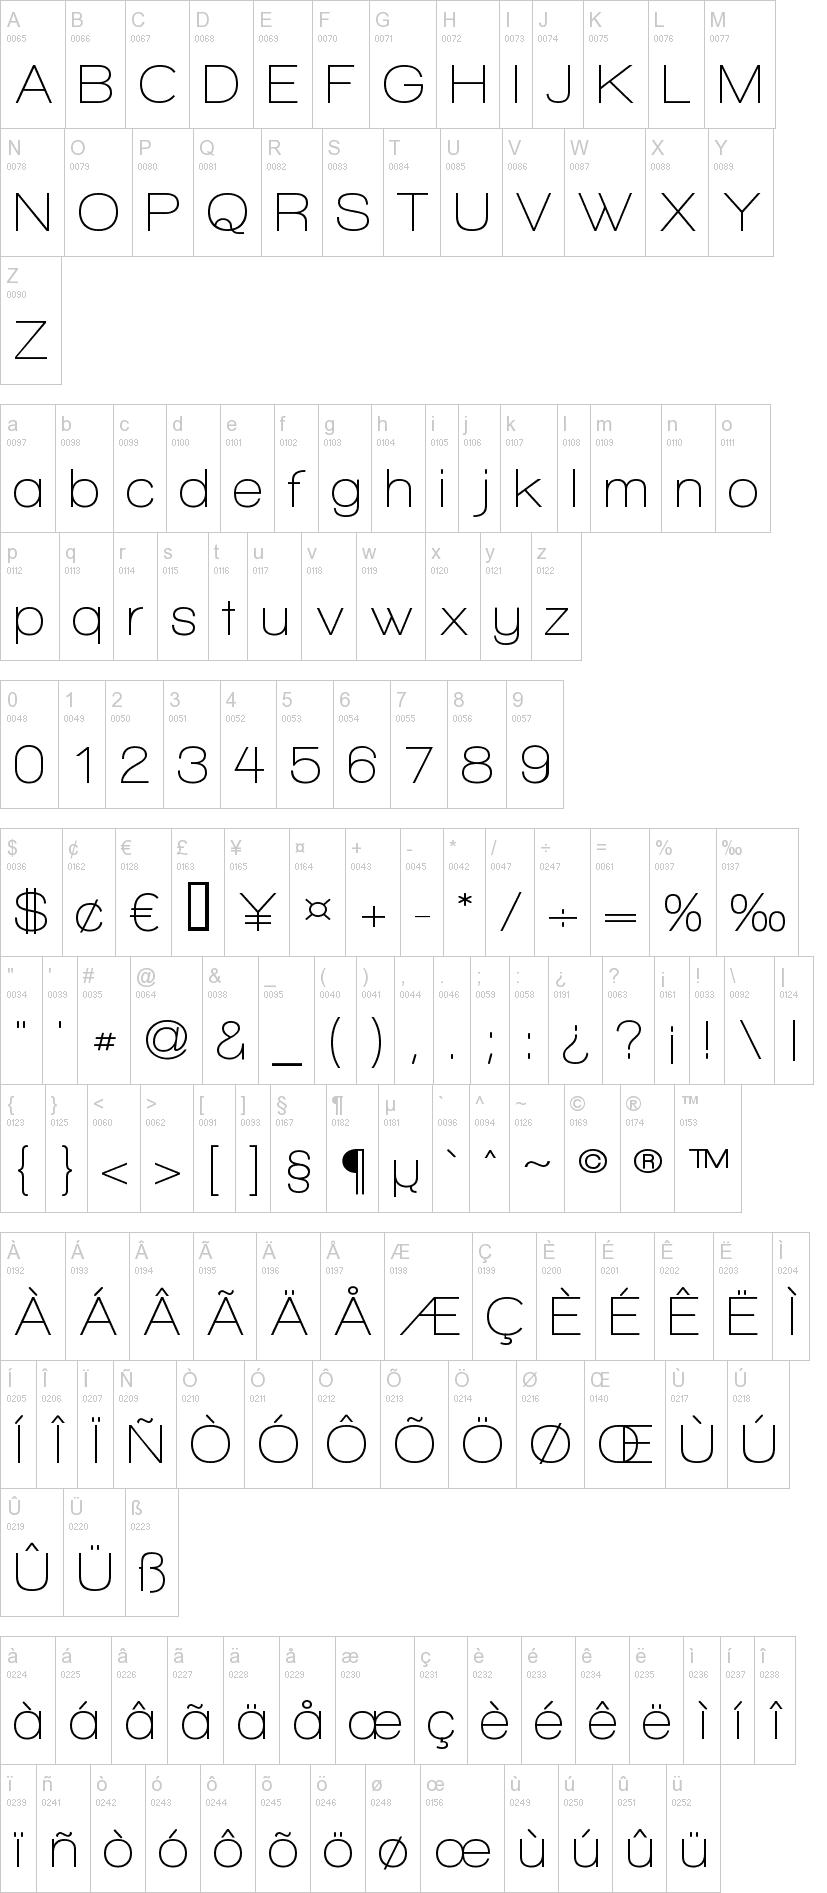 Leaf Fonts Dafont | Jidileaf co